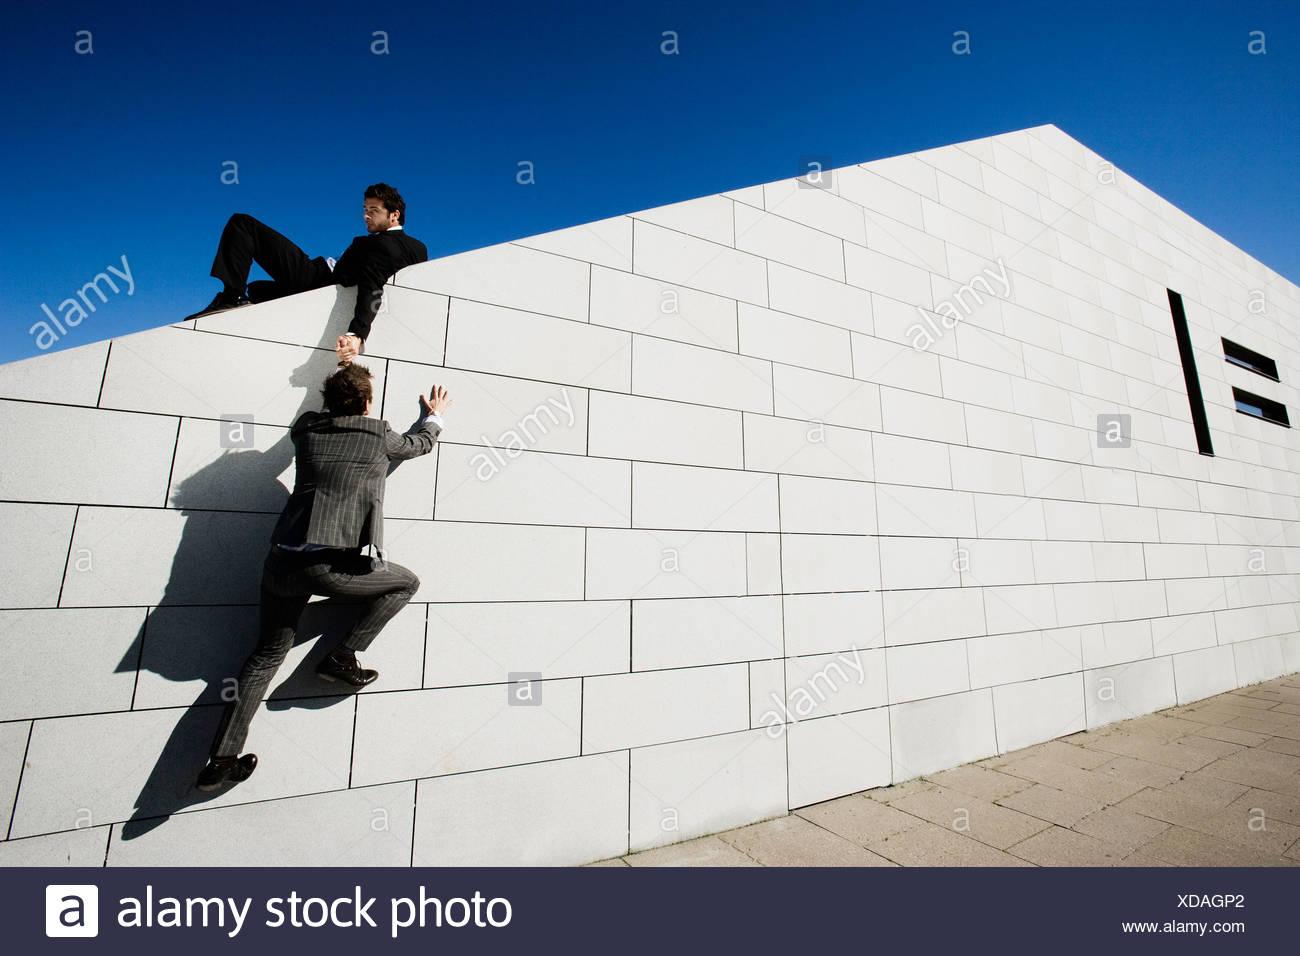 Menschen Anderen Menschen Helfen Uber Mauer Stockfotografie Alamy